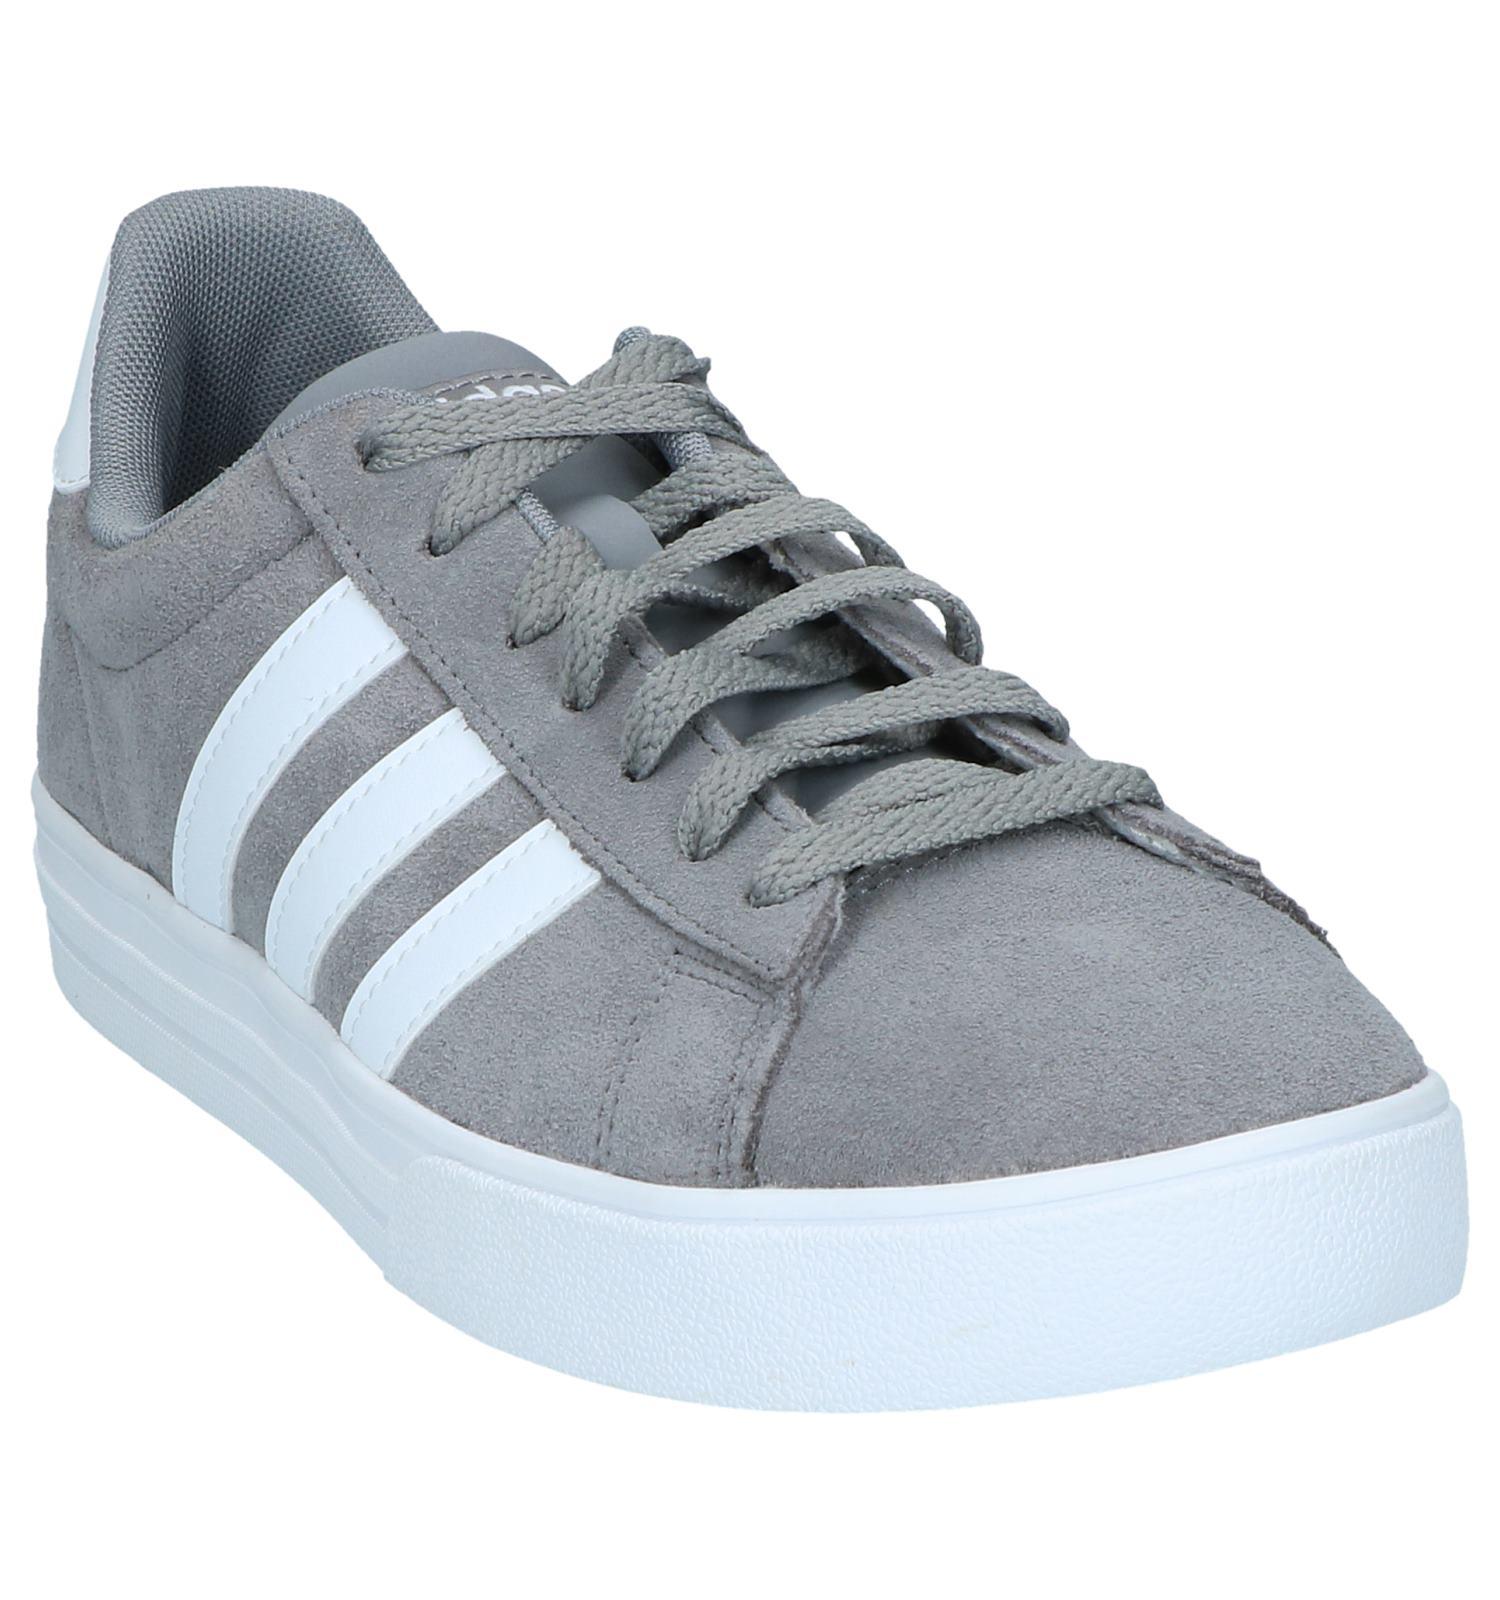 adidas Daily 2.0 Grijze Sneaker   Avantisport.nl